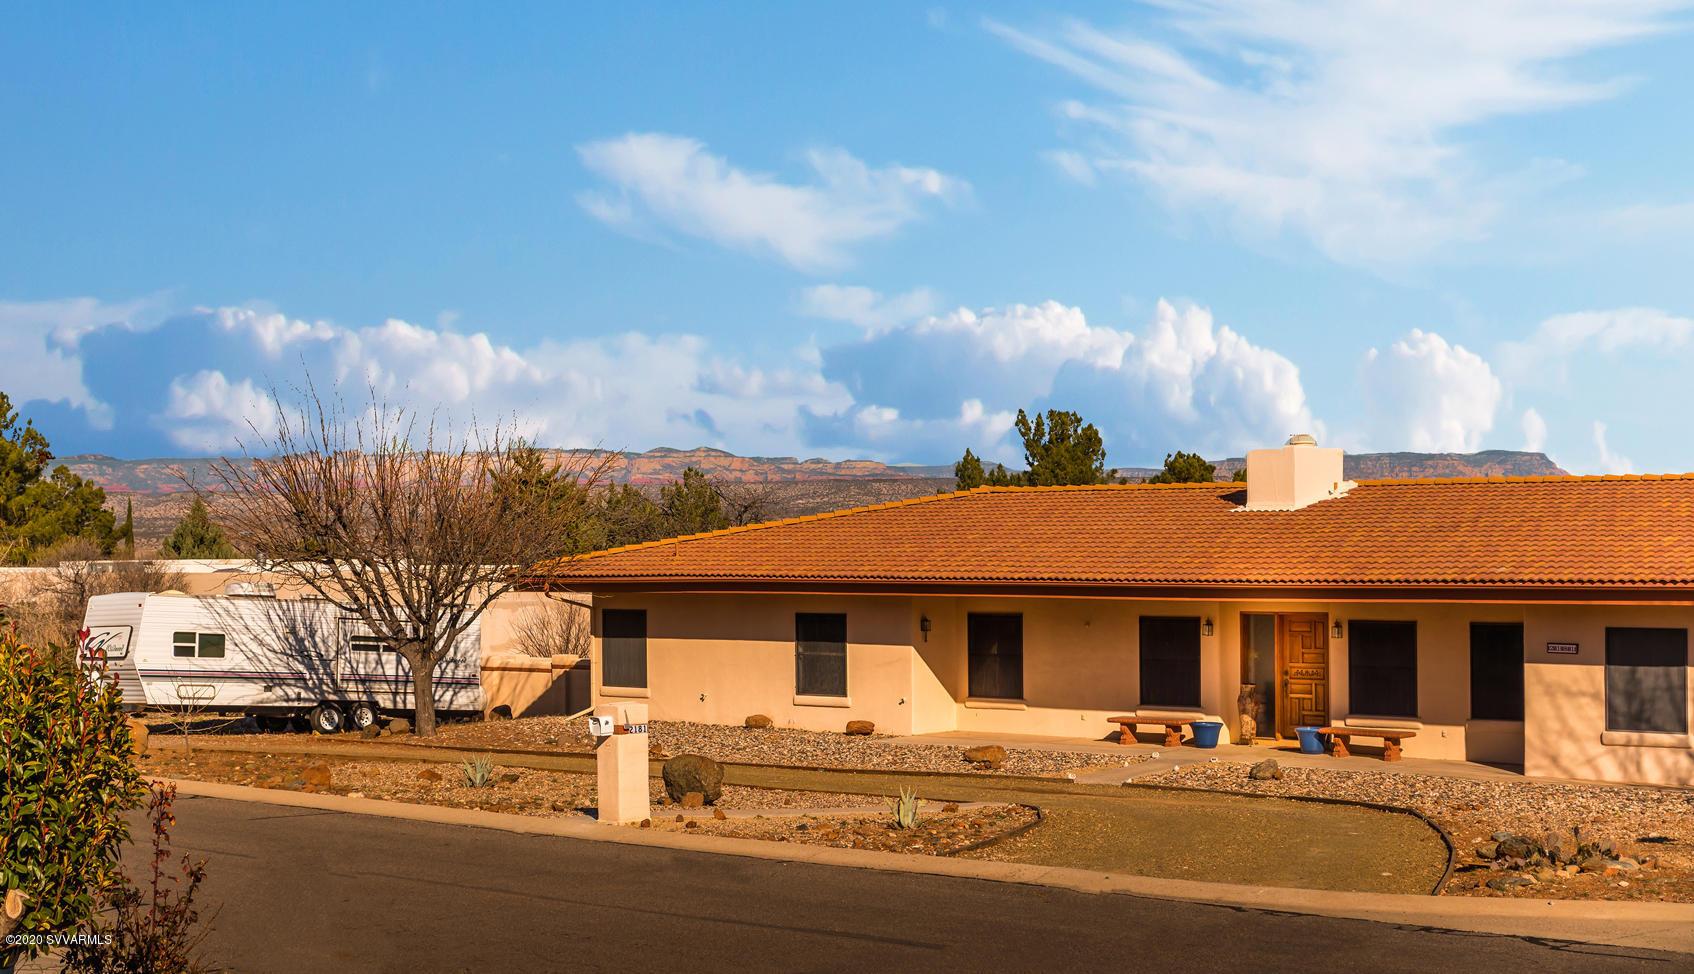 2181 Sky Drive Clarkdale, AZ 86324